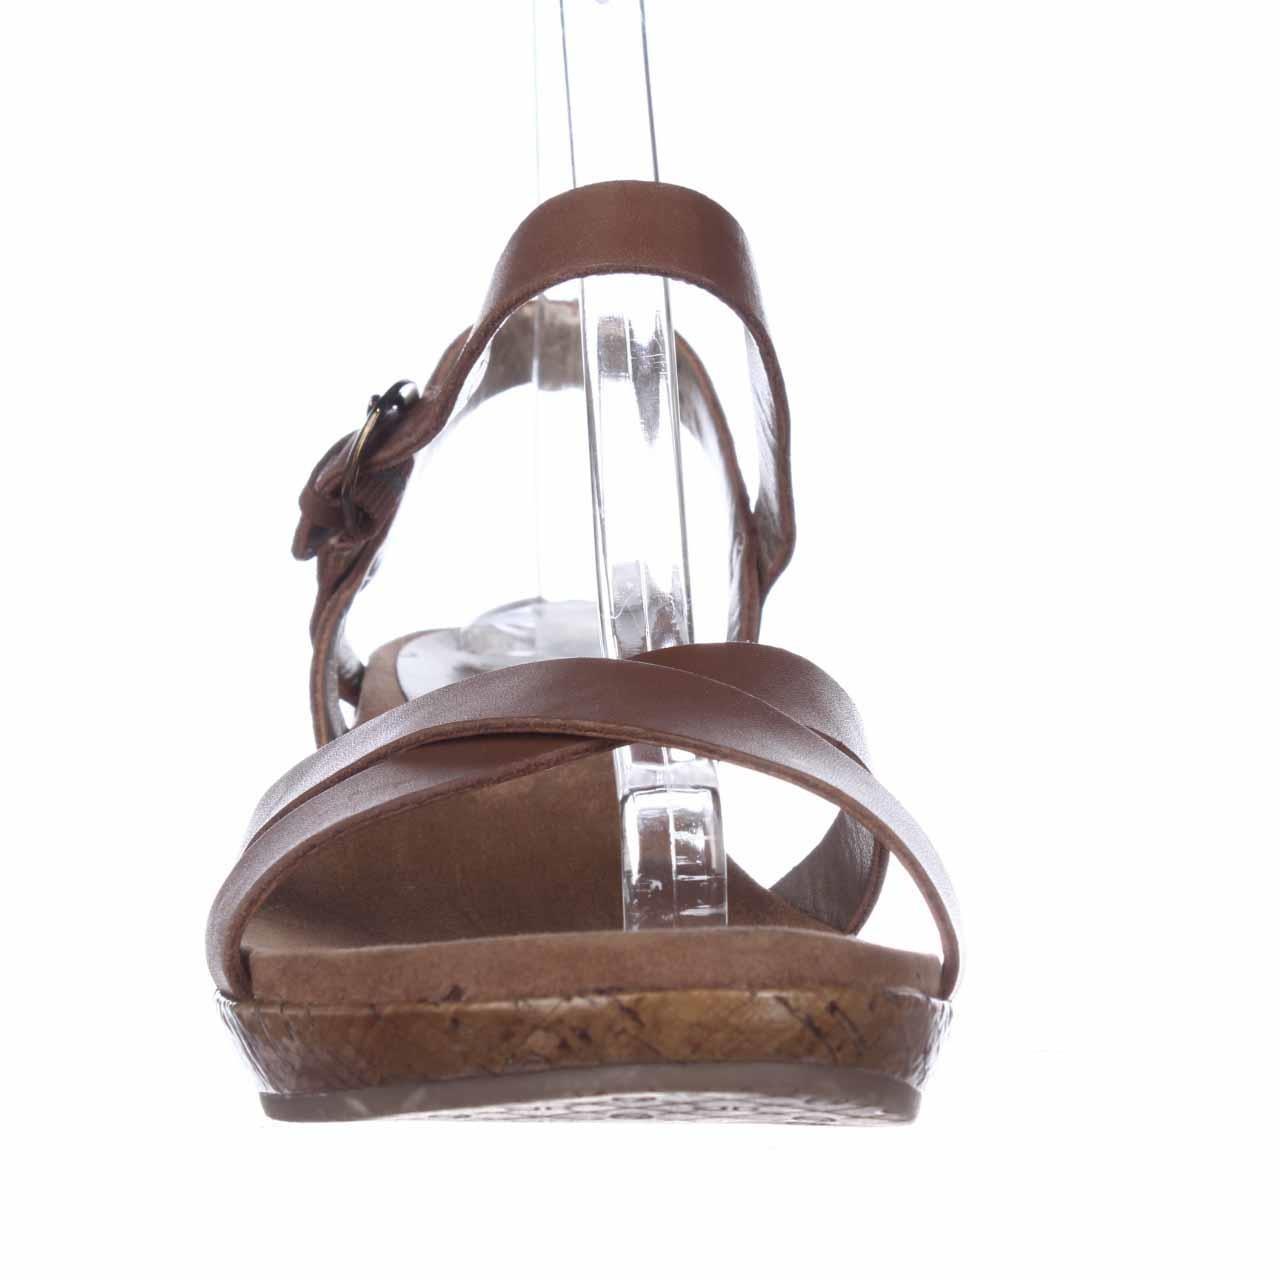 47ab9dfe9e3 Lyst - Circa Joan   David Payton Cork Wedge Sandals in Brown